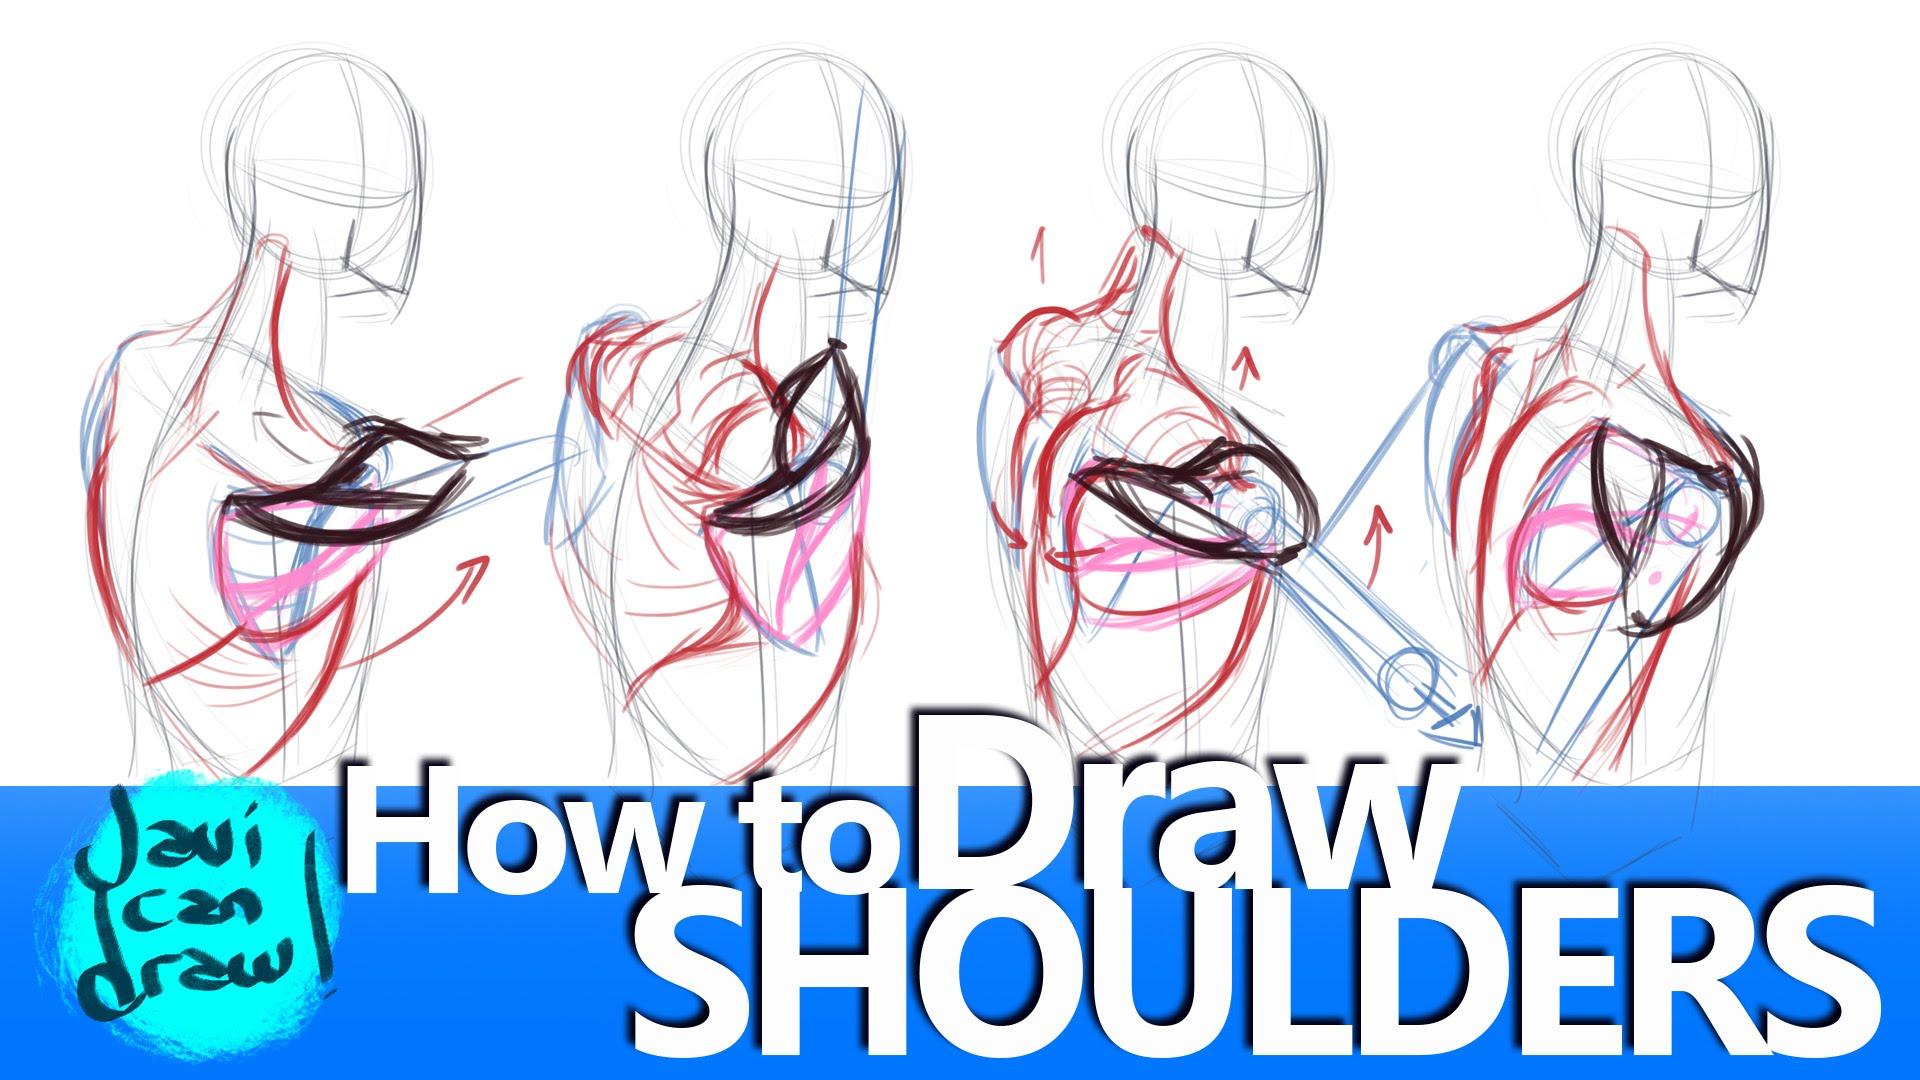 1920x1080 Shoulder Blades Are The Secret For Drawing Shoulders!